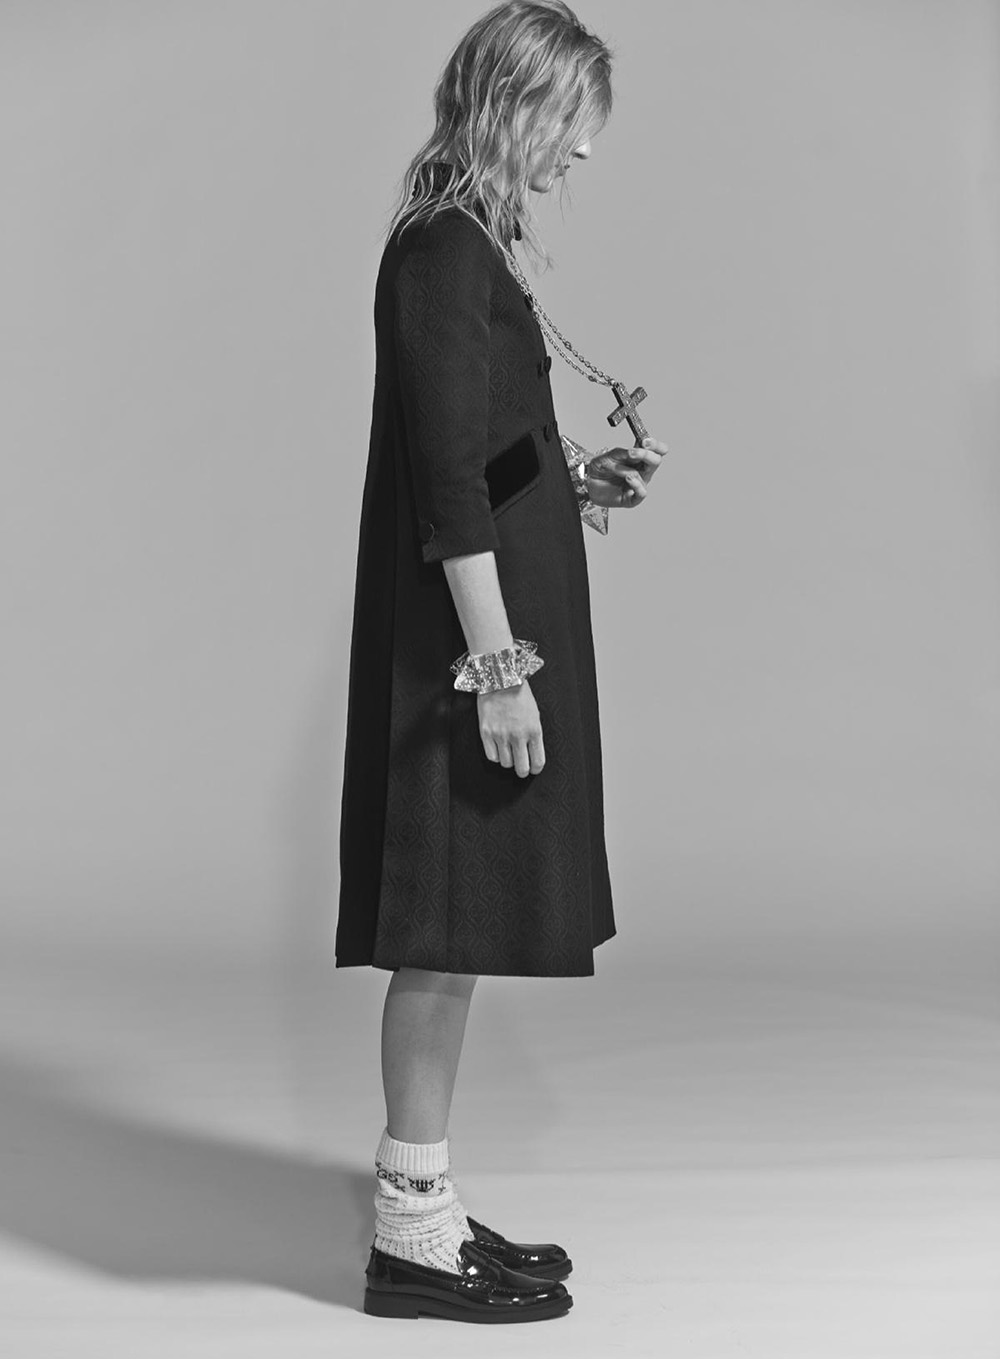 Julia Nobis by Collier Schorr for Harper's Bazaar US November 2020